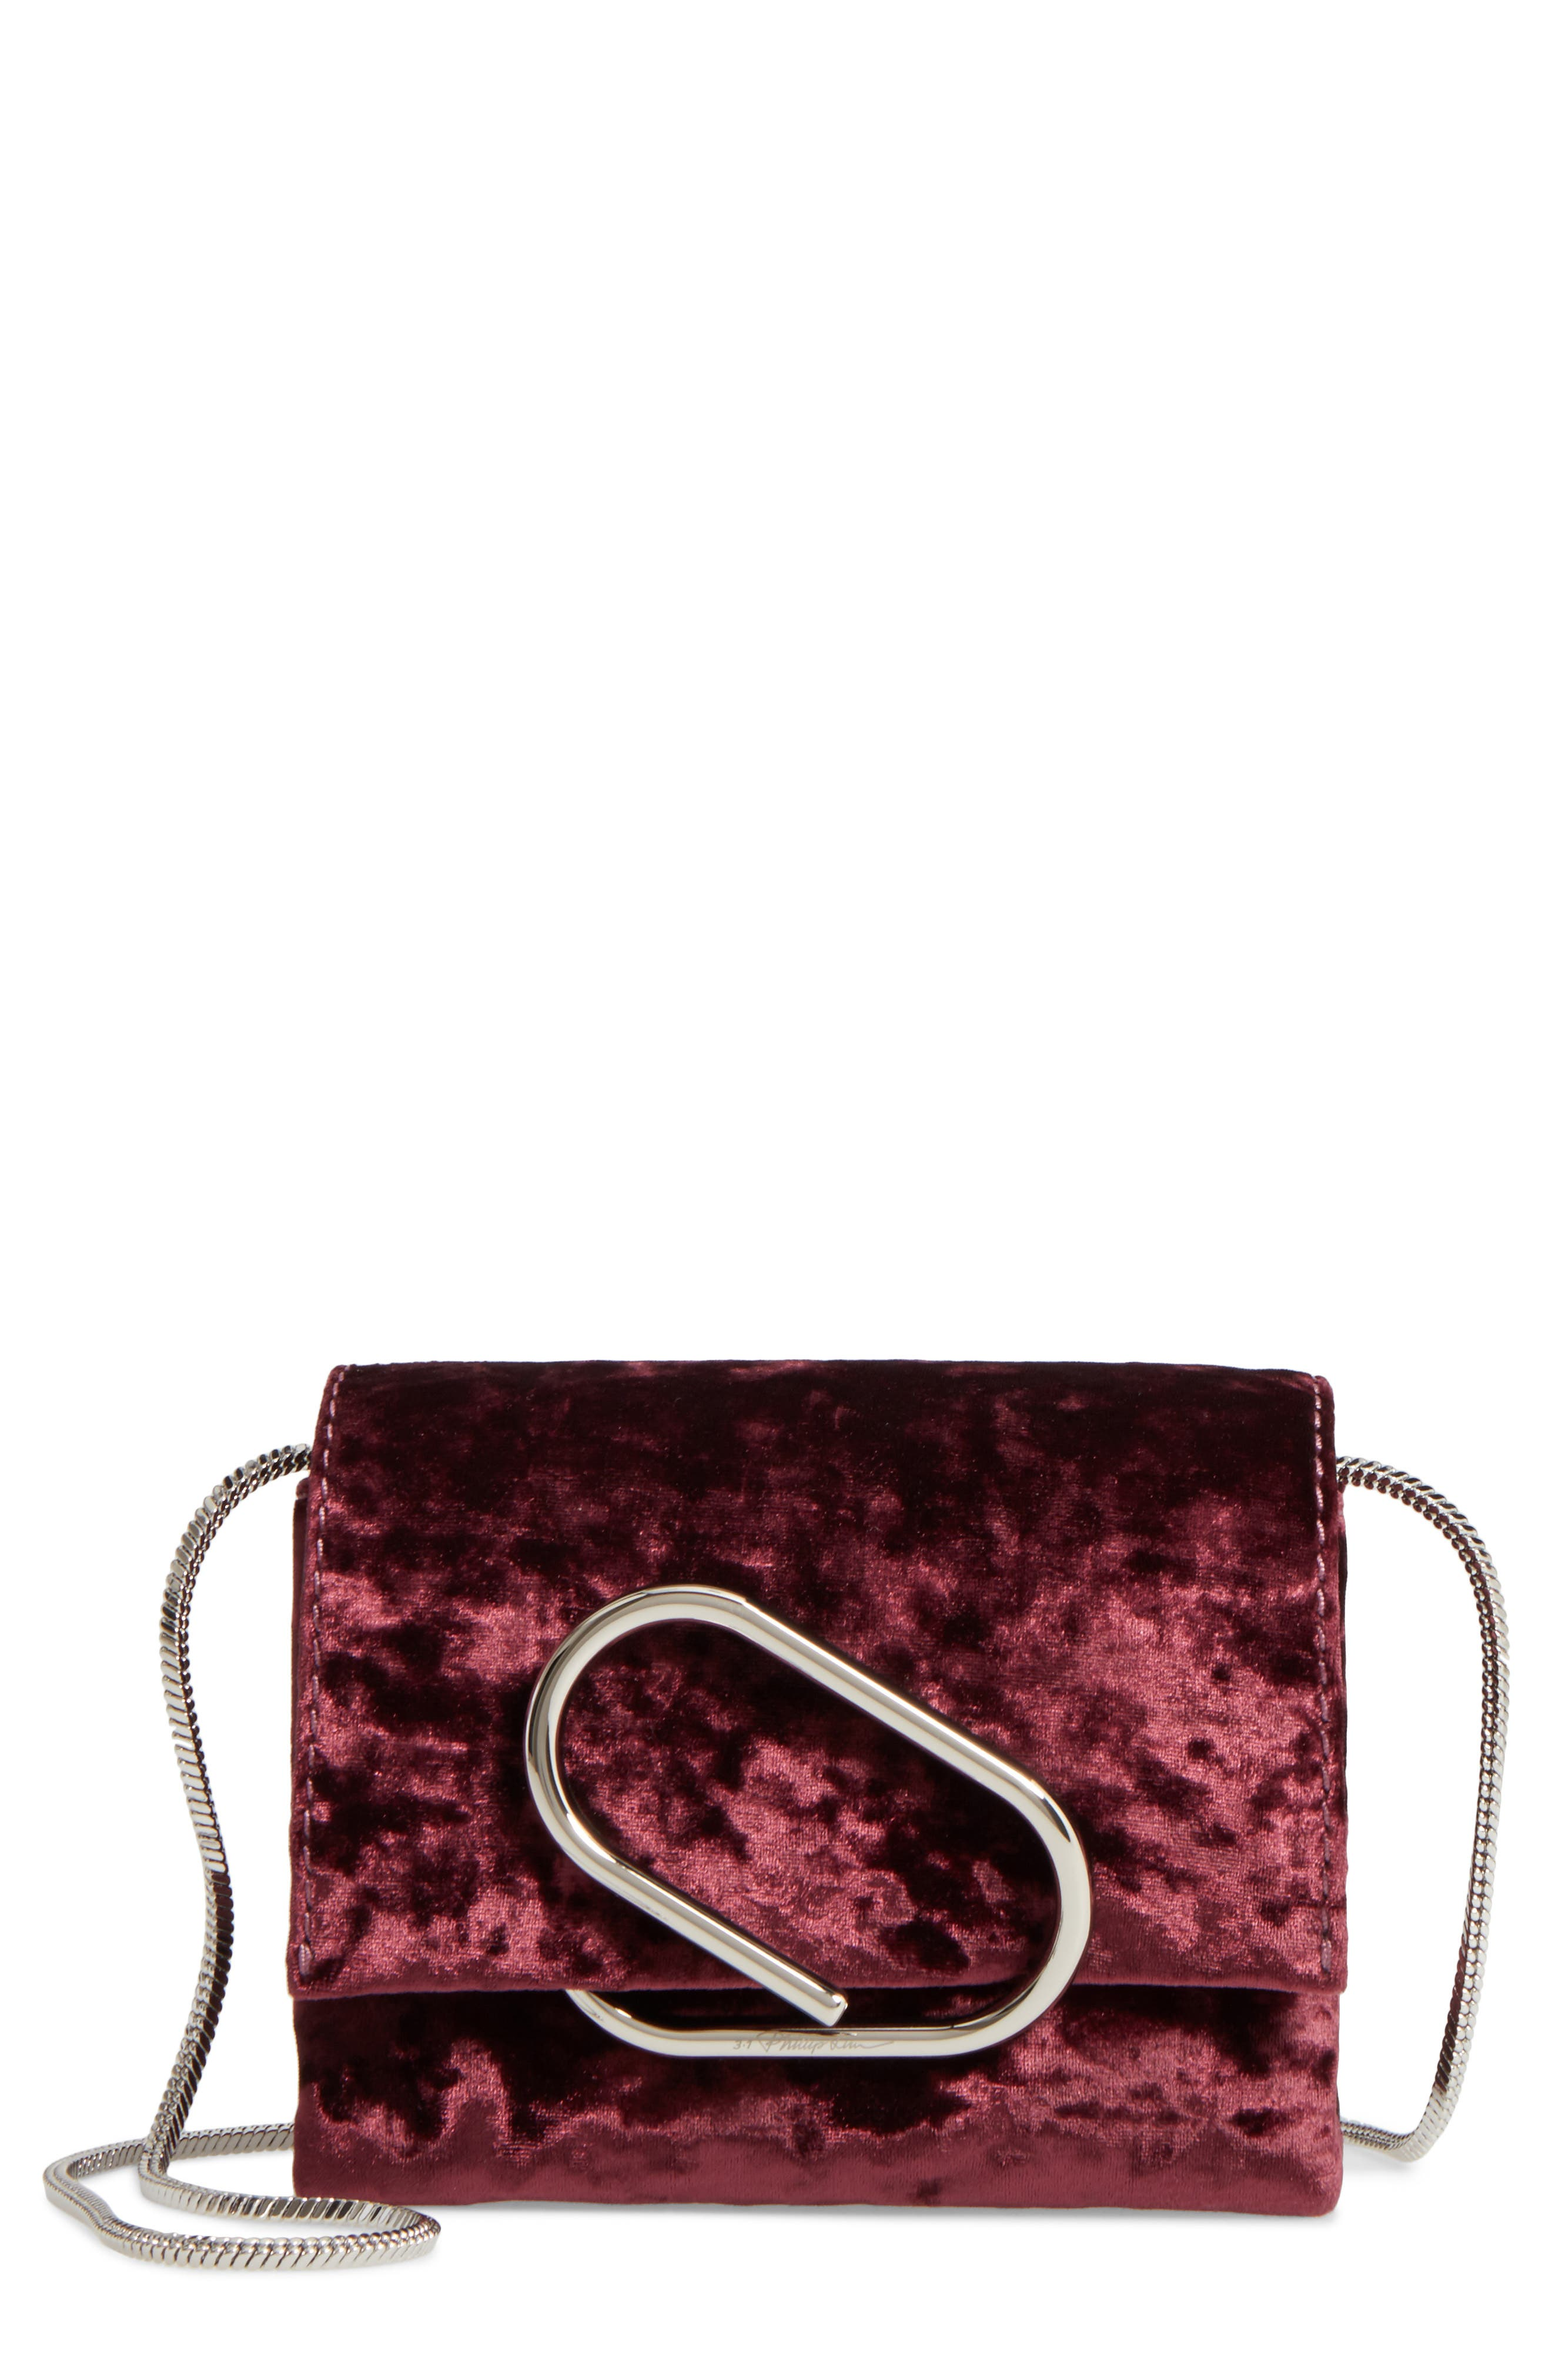 Main Image - 3.1 Phillip Lim Micro Alix Velvet Crossbody Bag